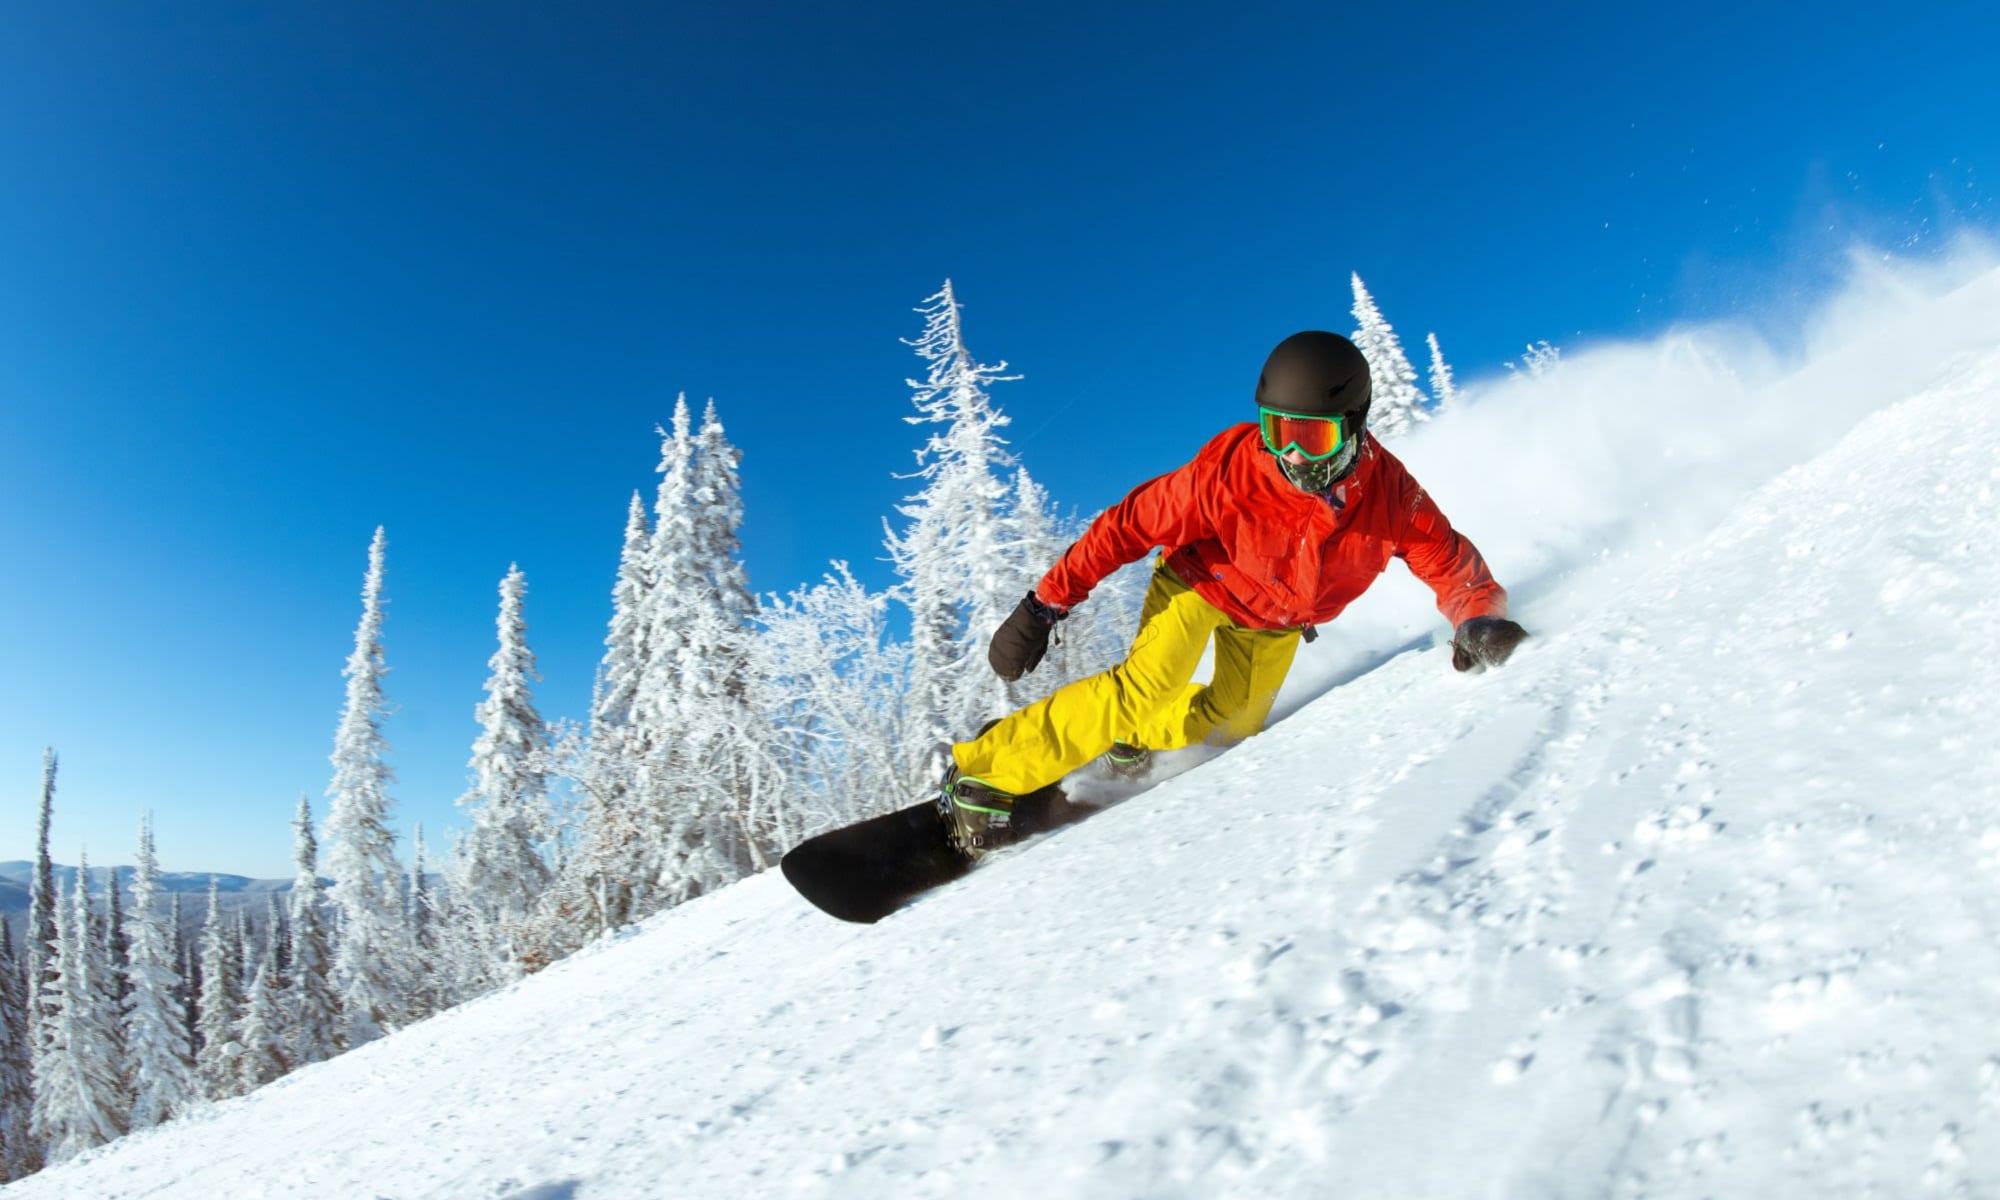 Awesome snowboarding on the mountain near Liberty SKY in Salt Lake City, Utah